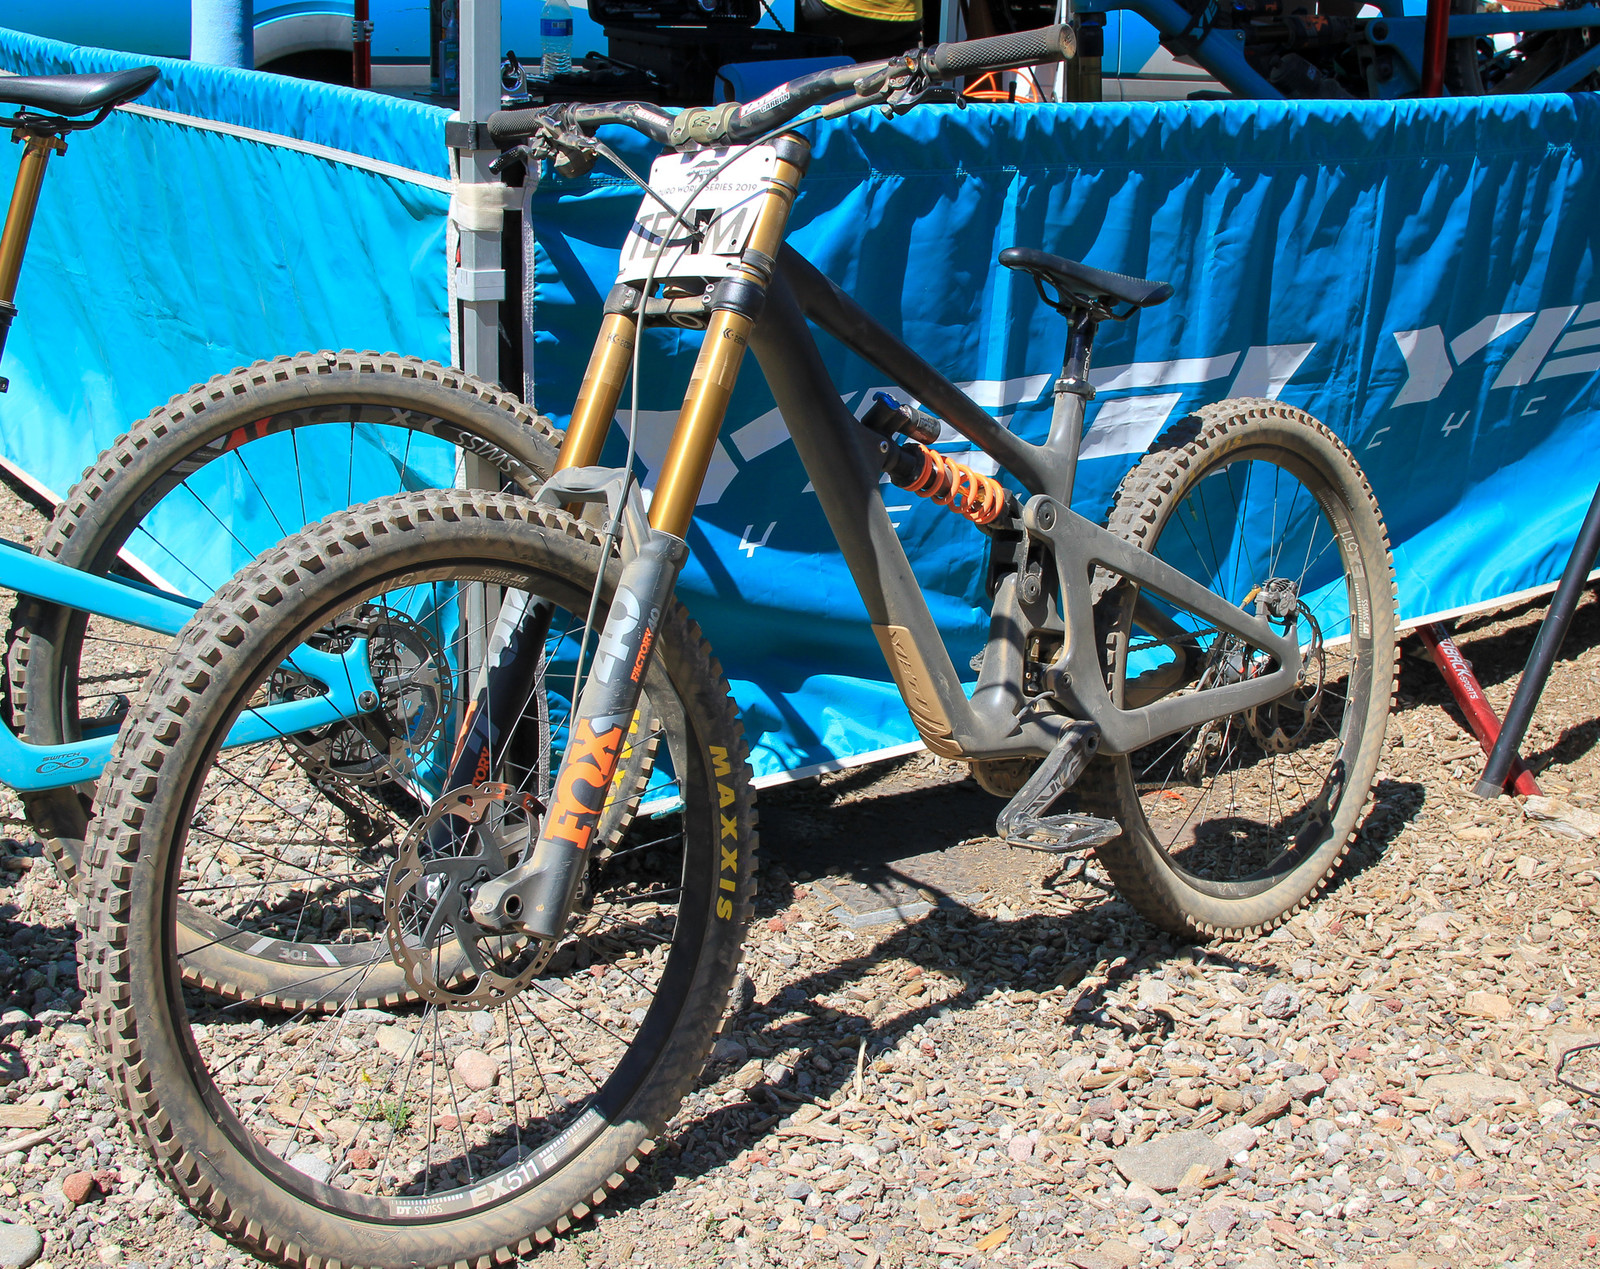 SB165 27.5 DH Bike - Pit Bits 2019 Enduro World Series - Northstar - Mountain Biking Pictures - Vital MTB